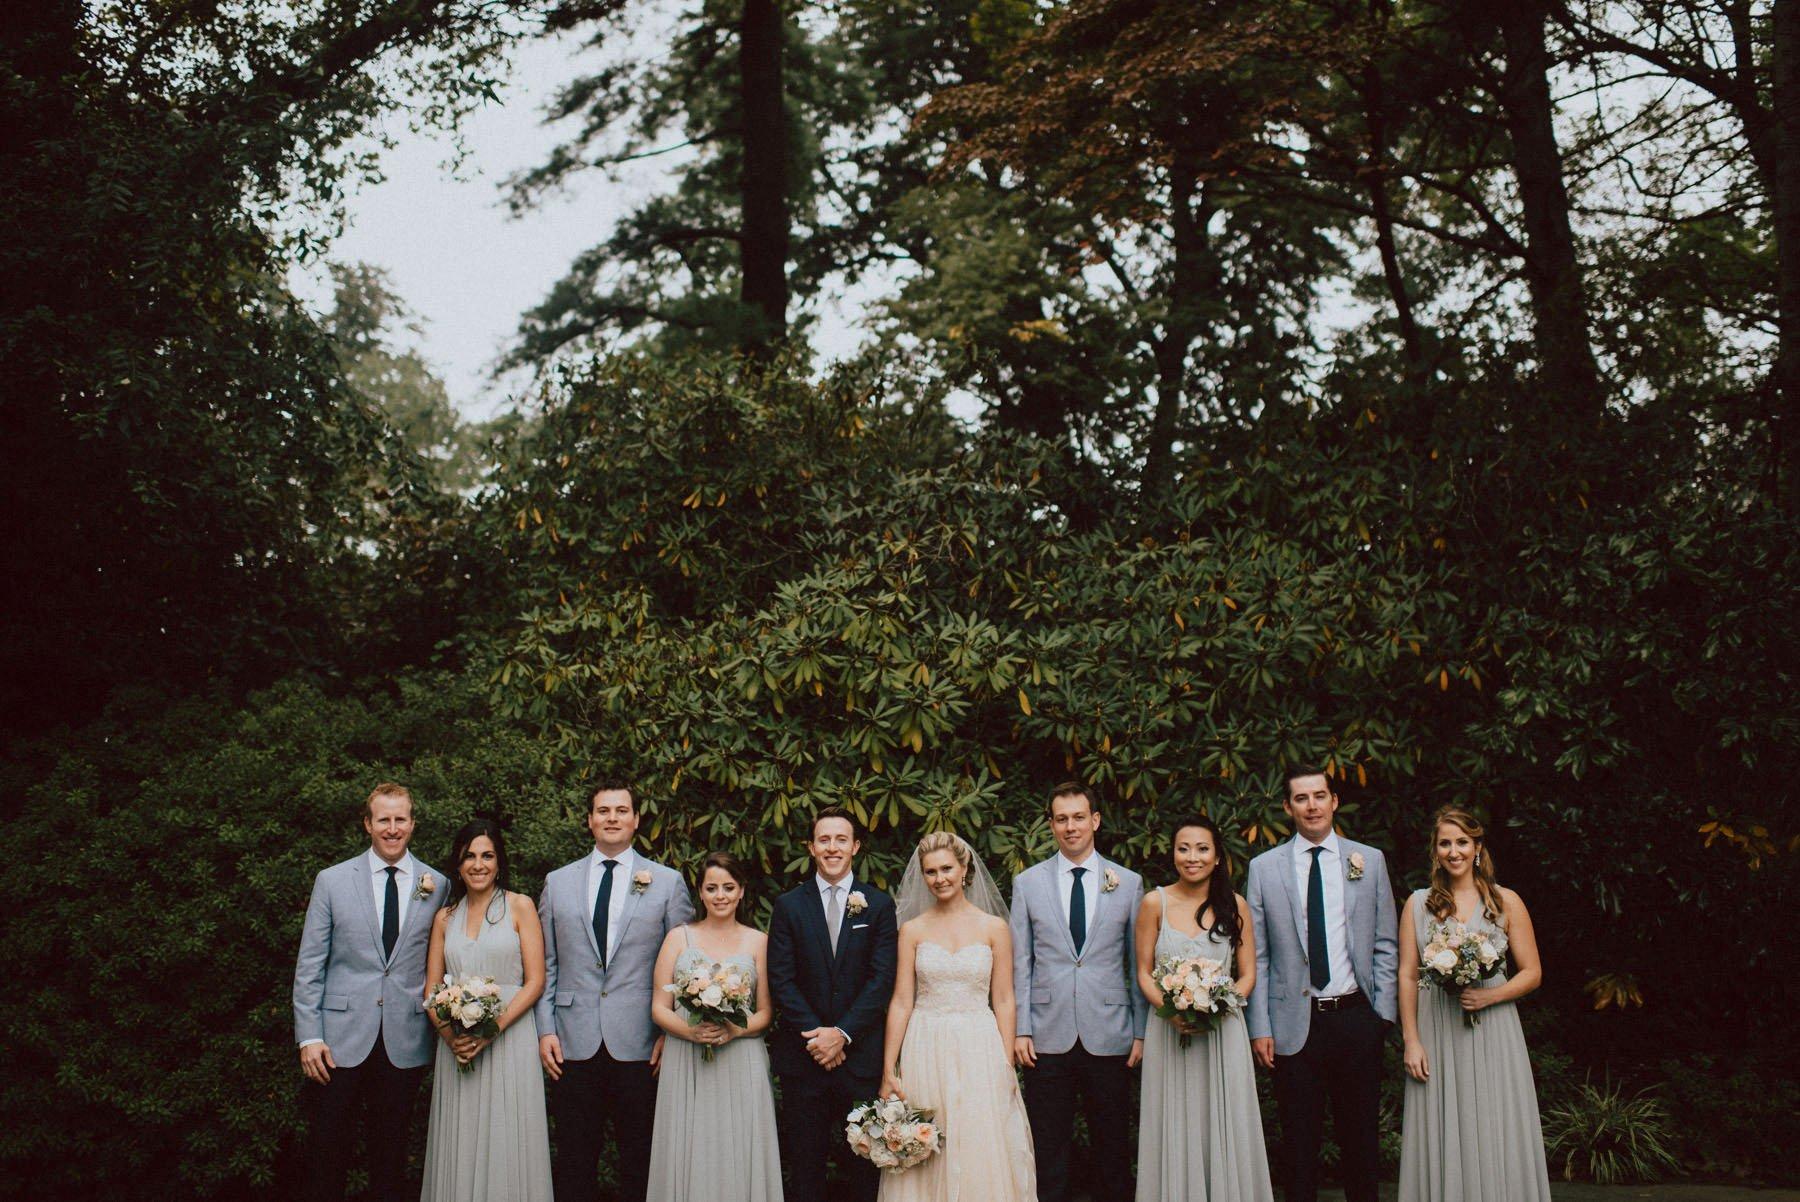 greenville-country-club-wedding-93.jpg